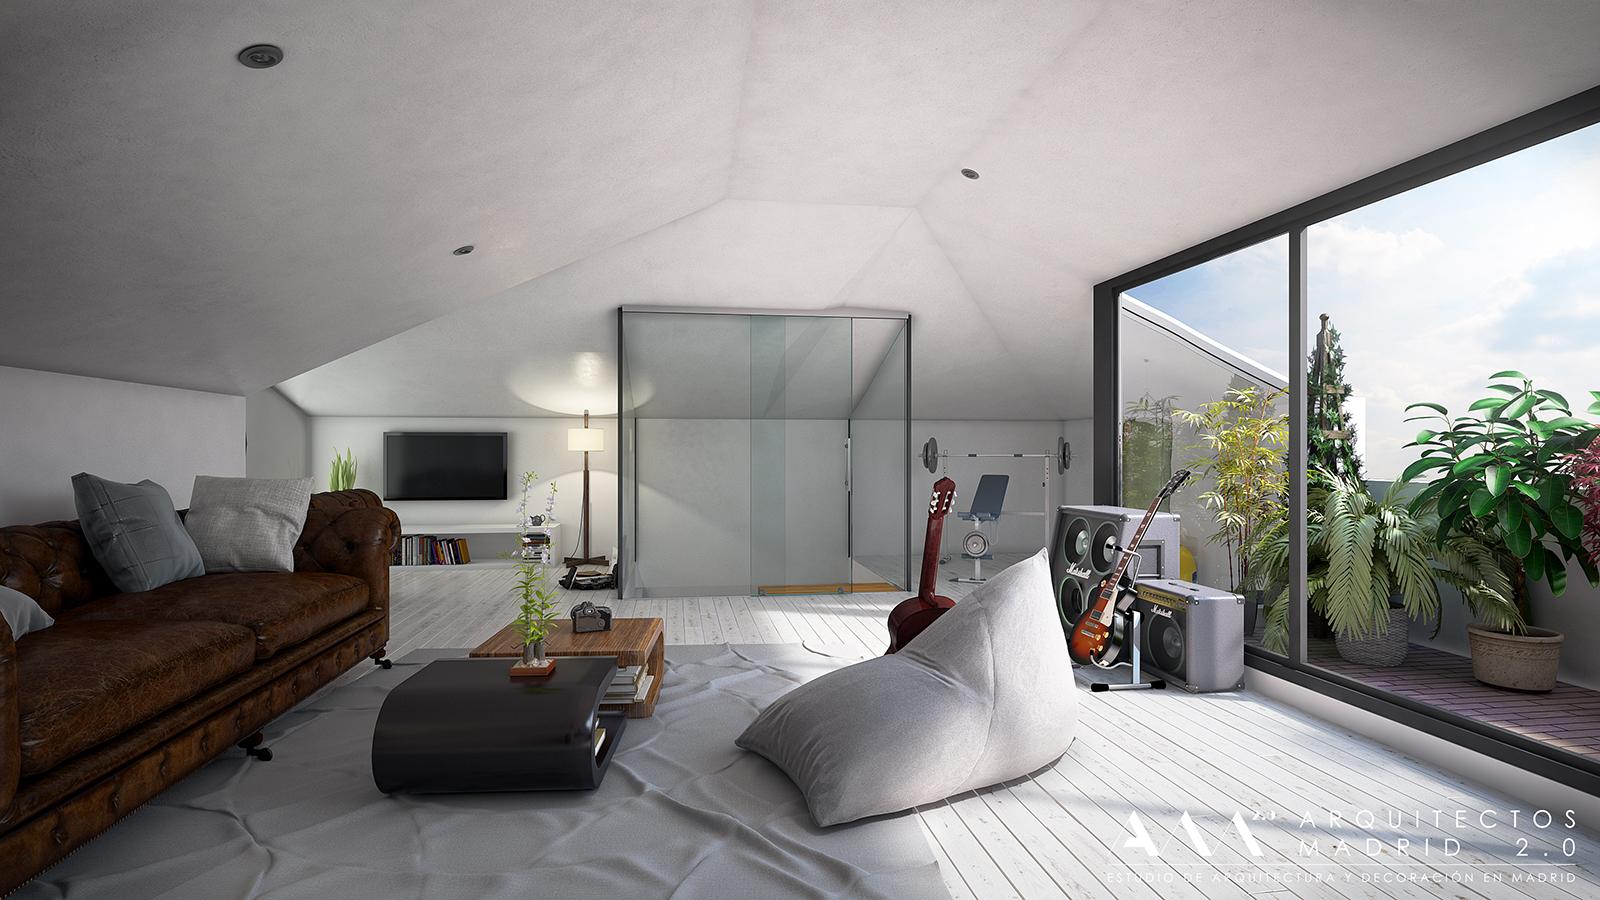 reformas de viviendas por arquitectos madrid 045 - Buhardillas Modernas